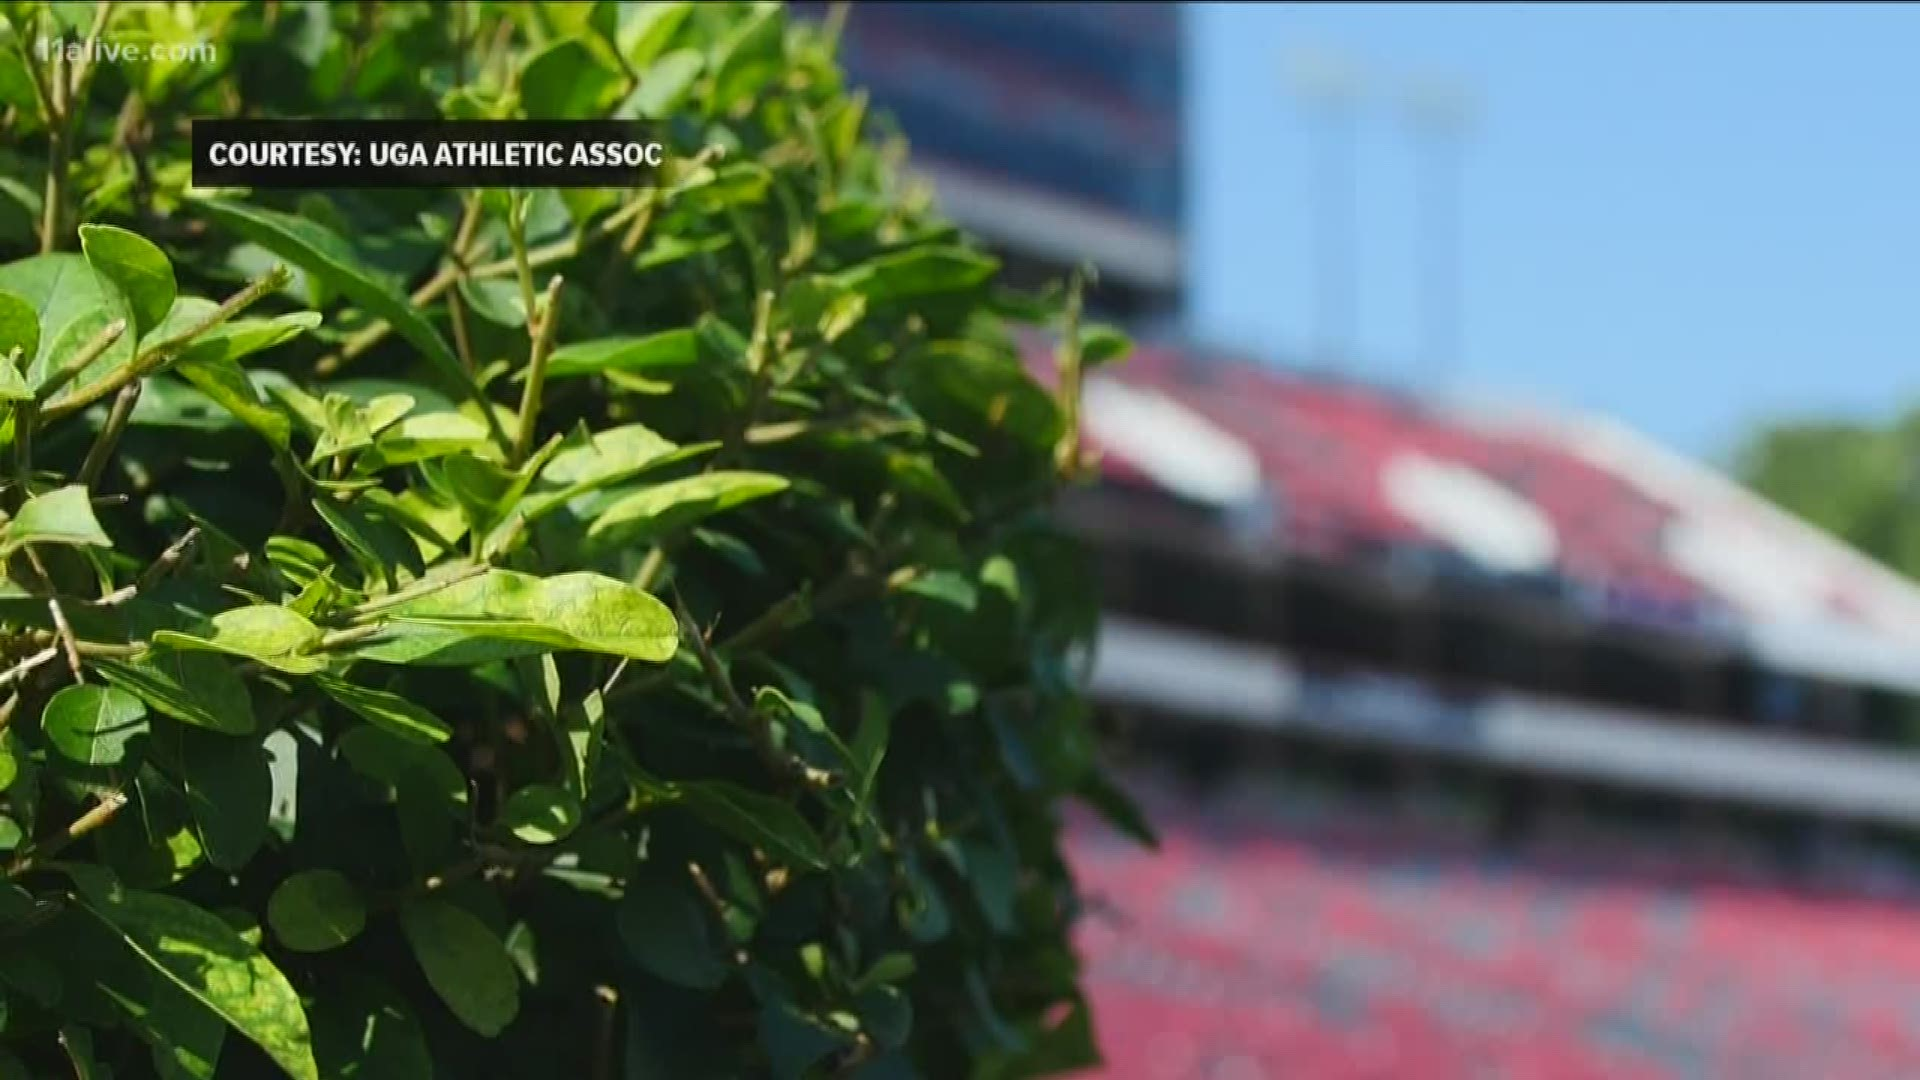 South Carolina Gamecocks Rip Up Uga Hedges At Sanford Stadium